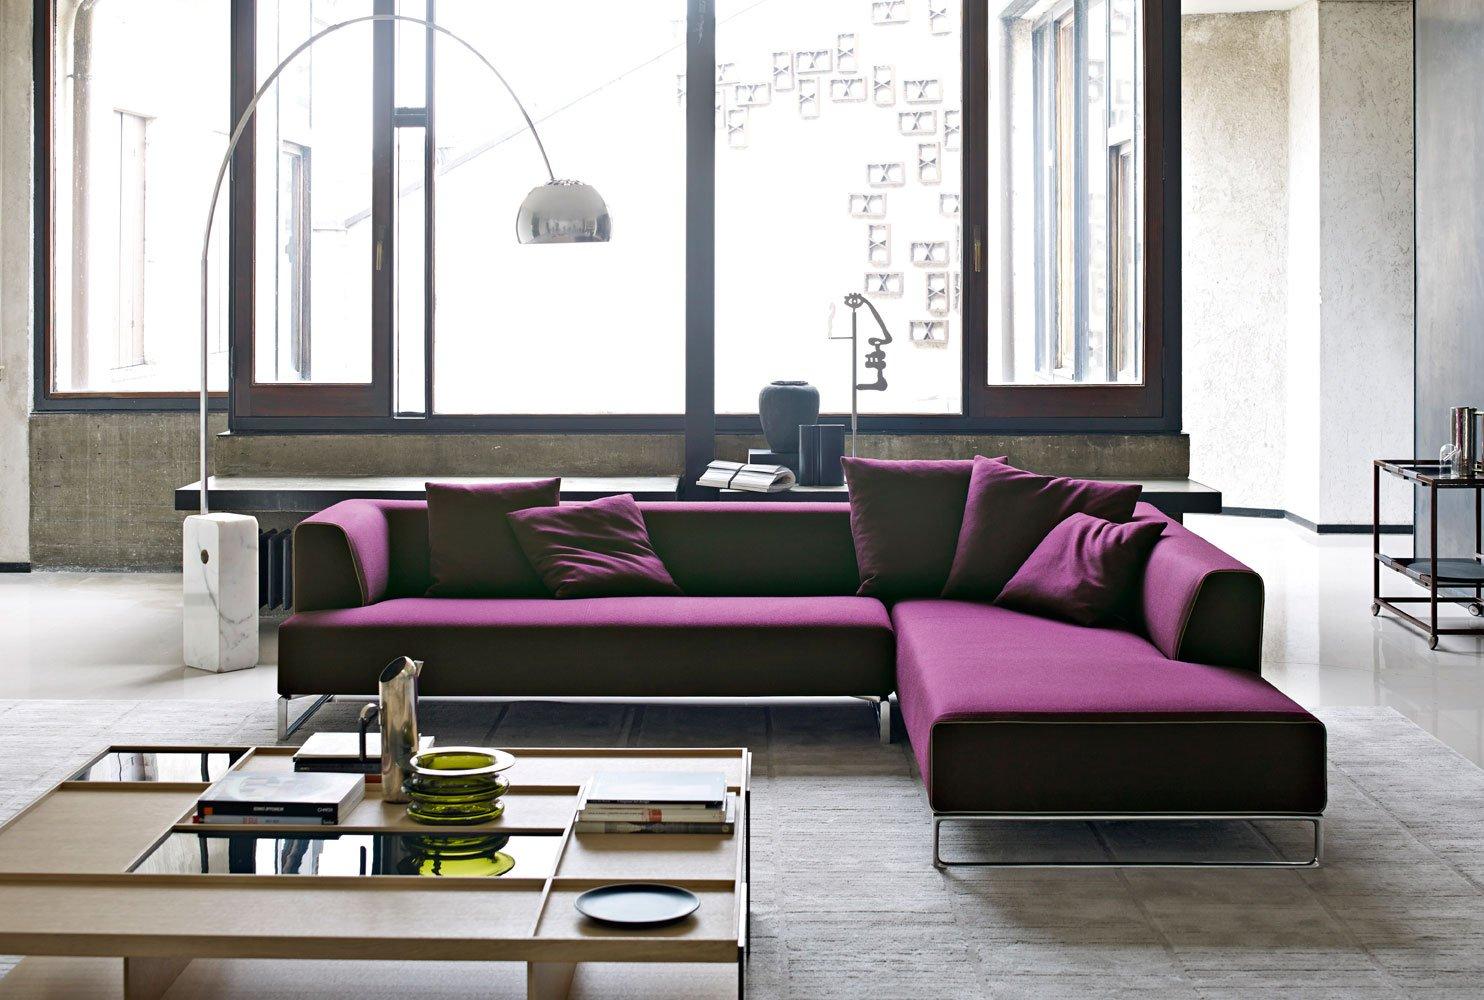 violett Interieur.jpg